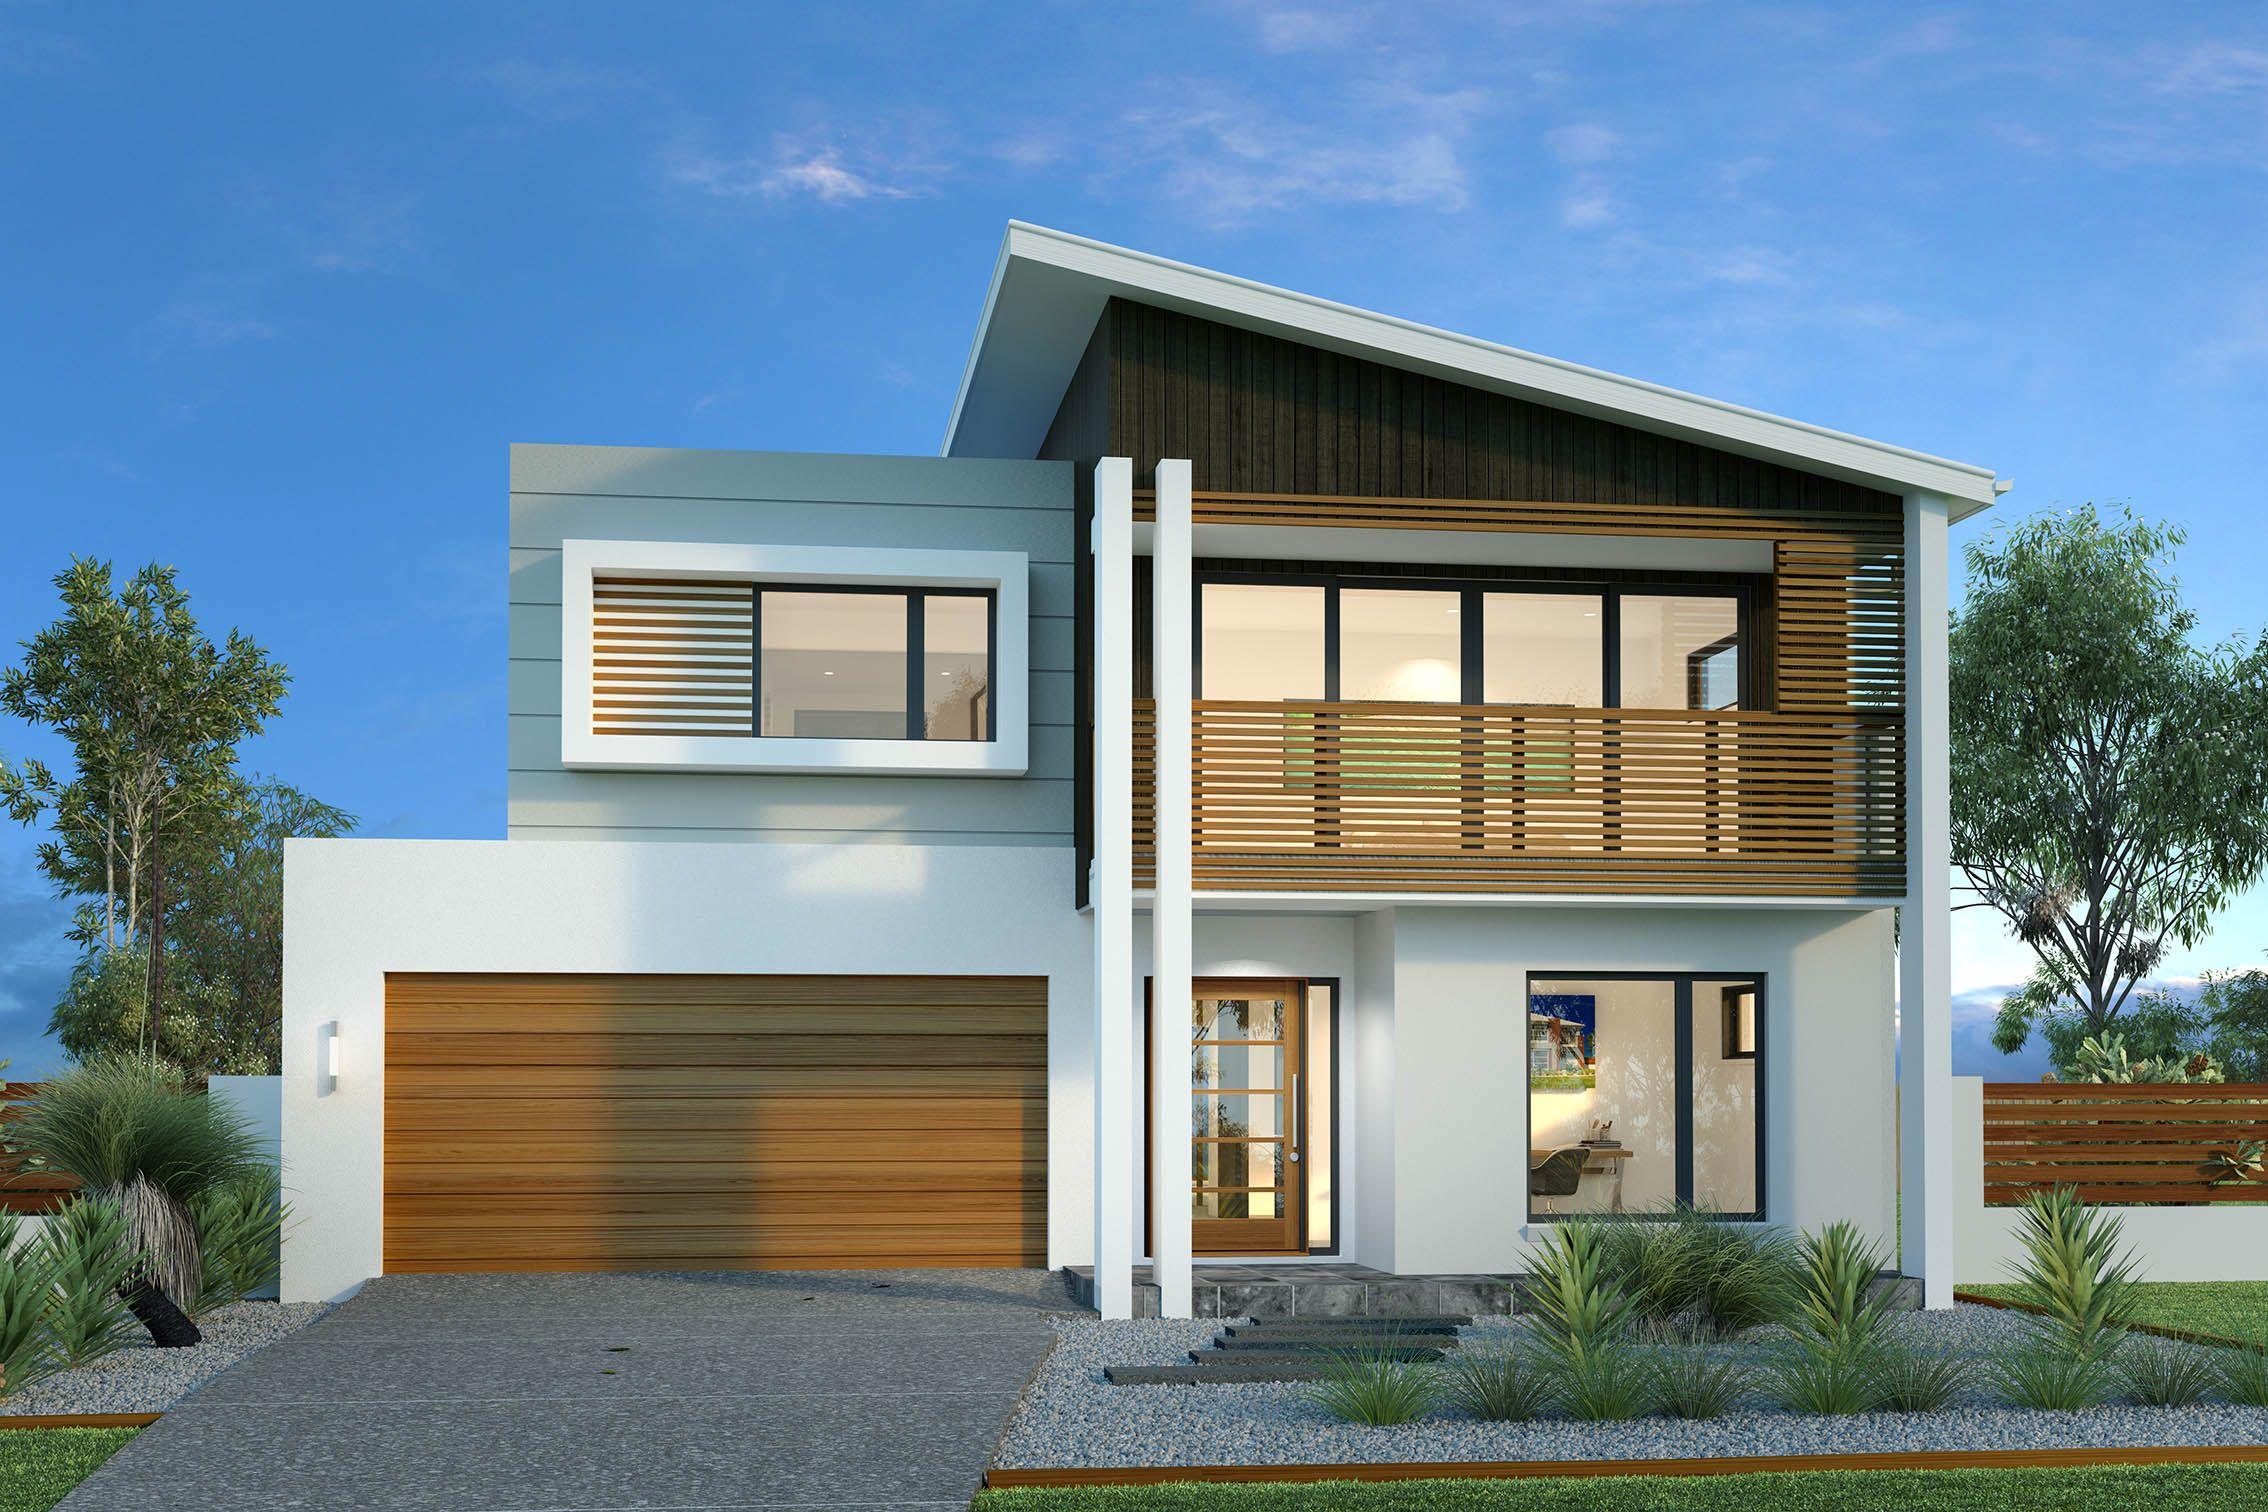 Kingscliff 324 Home Designs In Warrnambool G J Gardner Homes